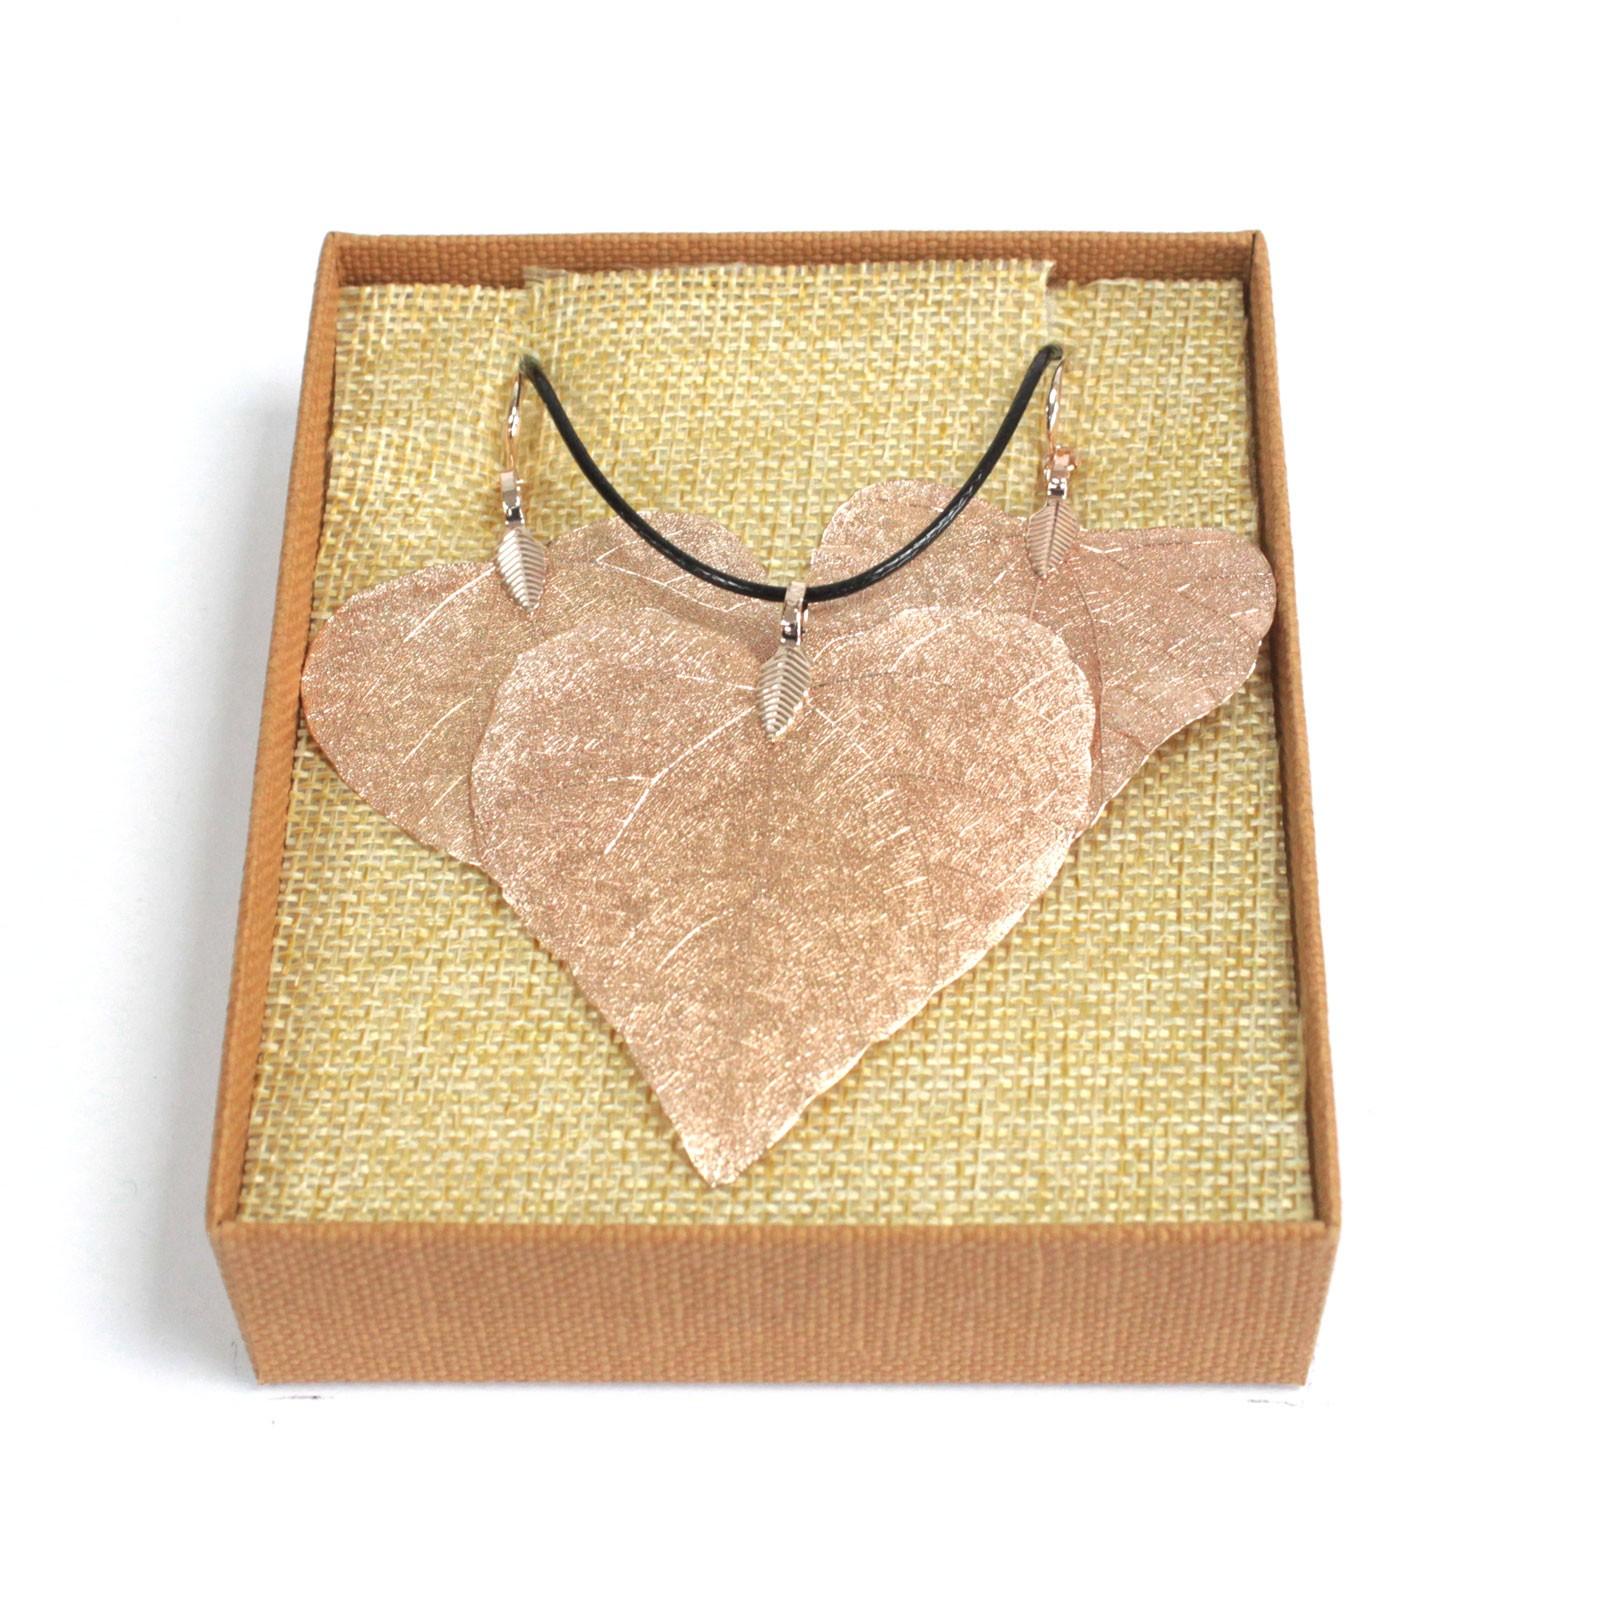 Necklace & Earring Set - Heart Leaf - Pink Gold